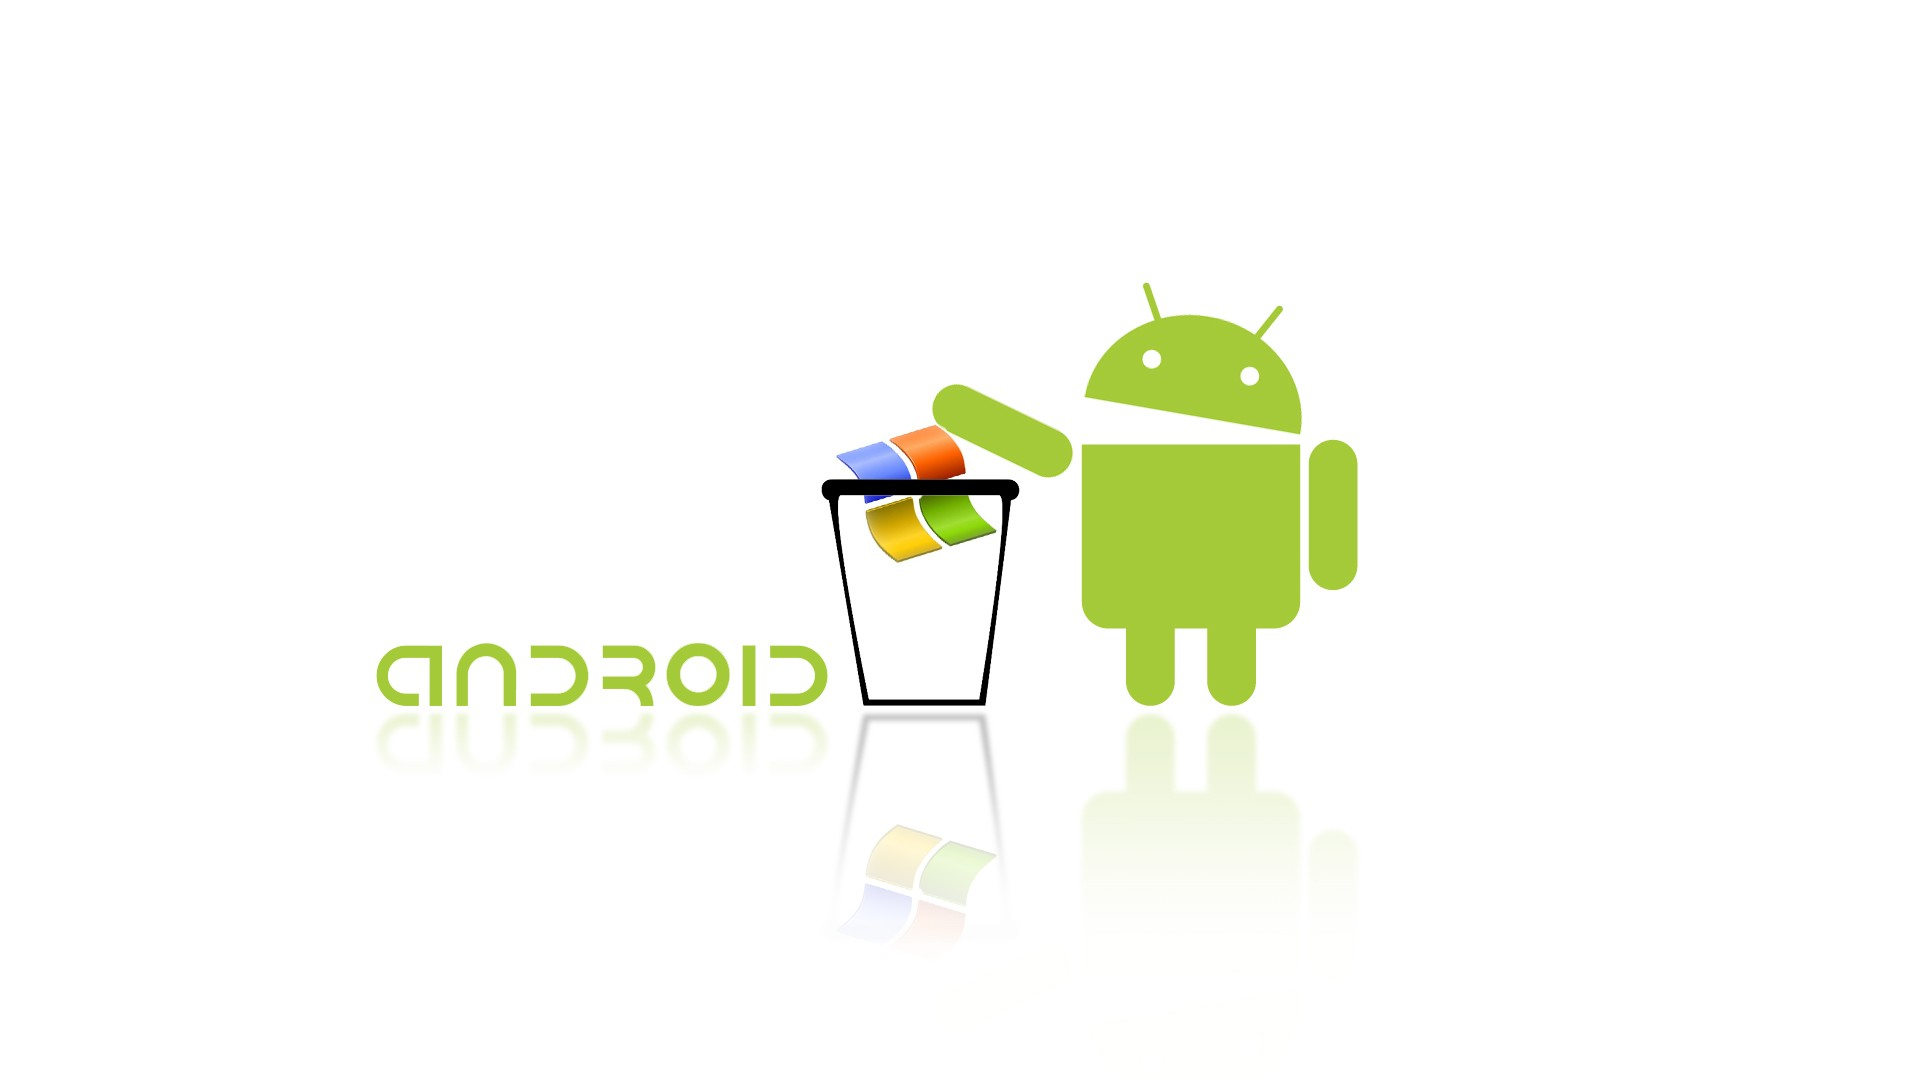 Android Mobileвпервые превзошёл Windows PC по количеству трафика в сети